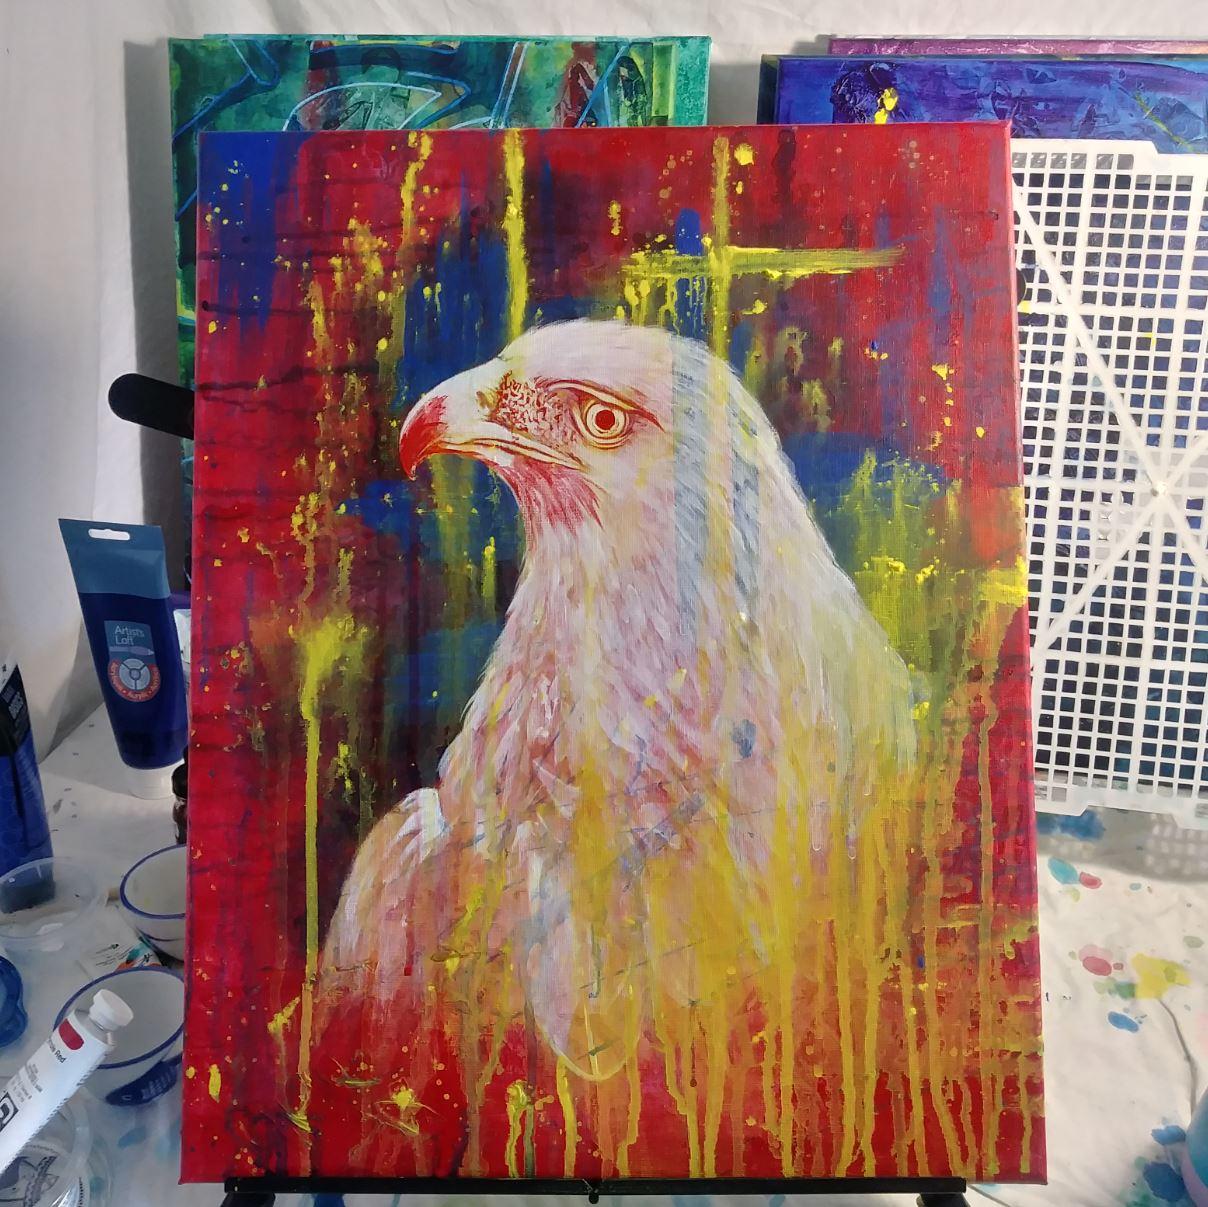 0964 golden eagle wip elisa friesen 2018.jpg